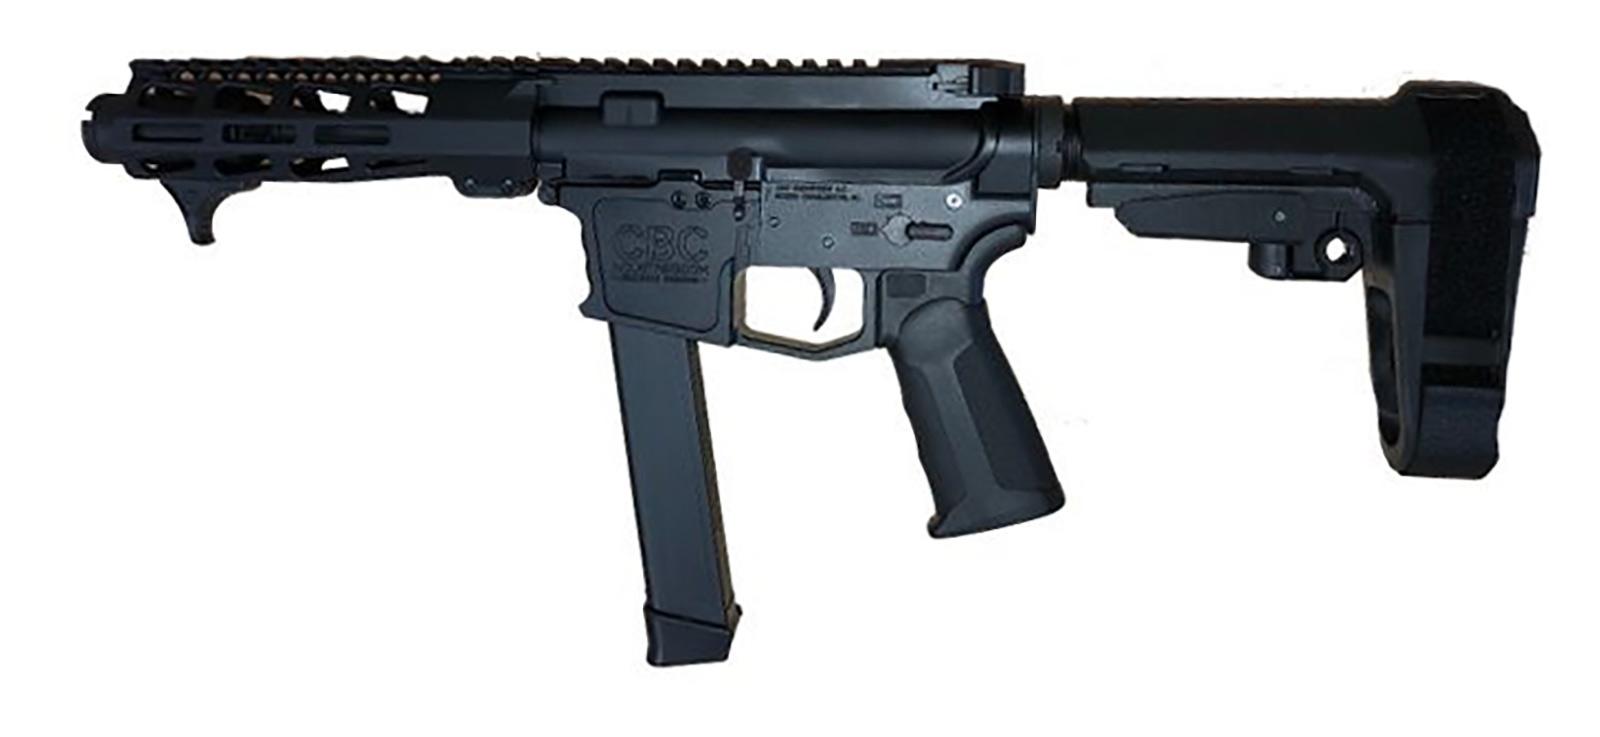 CBC PS2 Forged Aluminum AR Pistol - Black | 9mm | 4 5